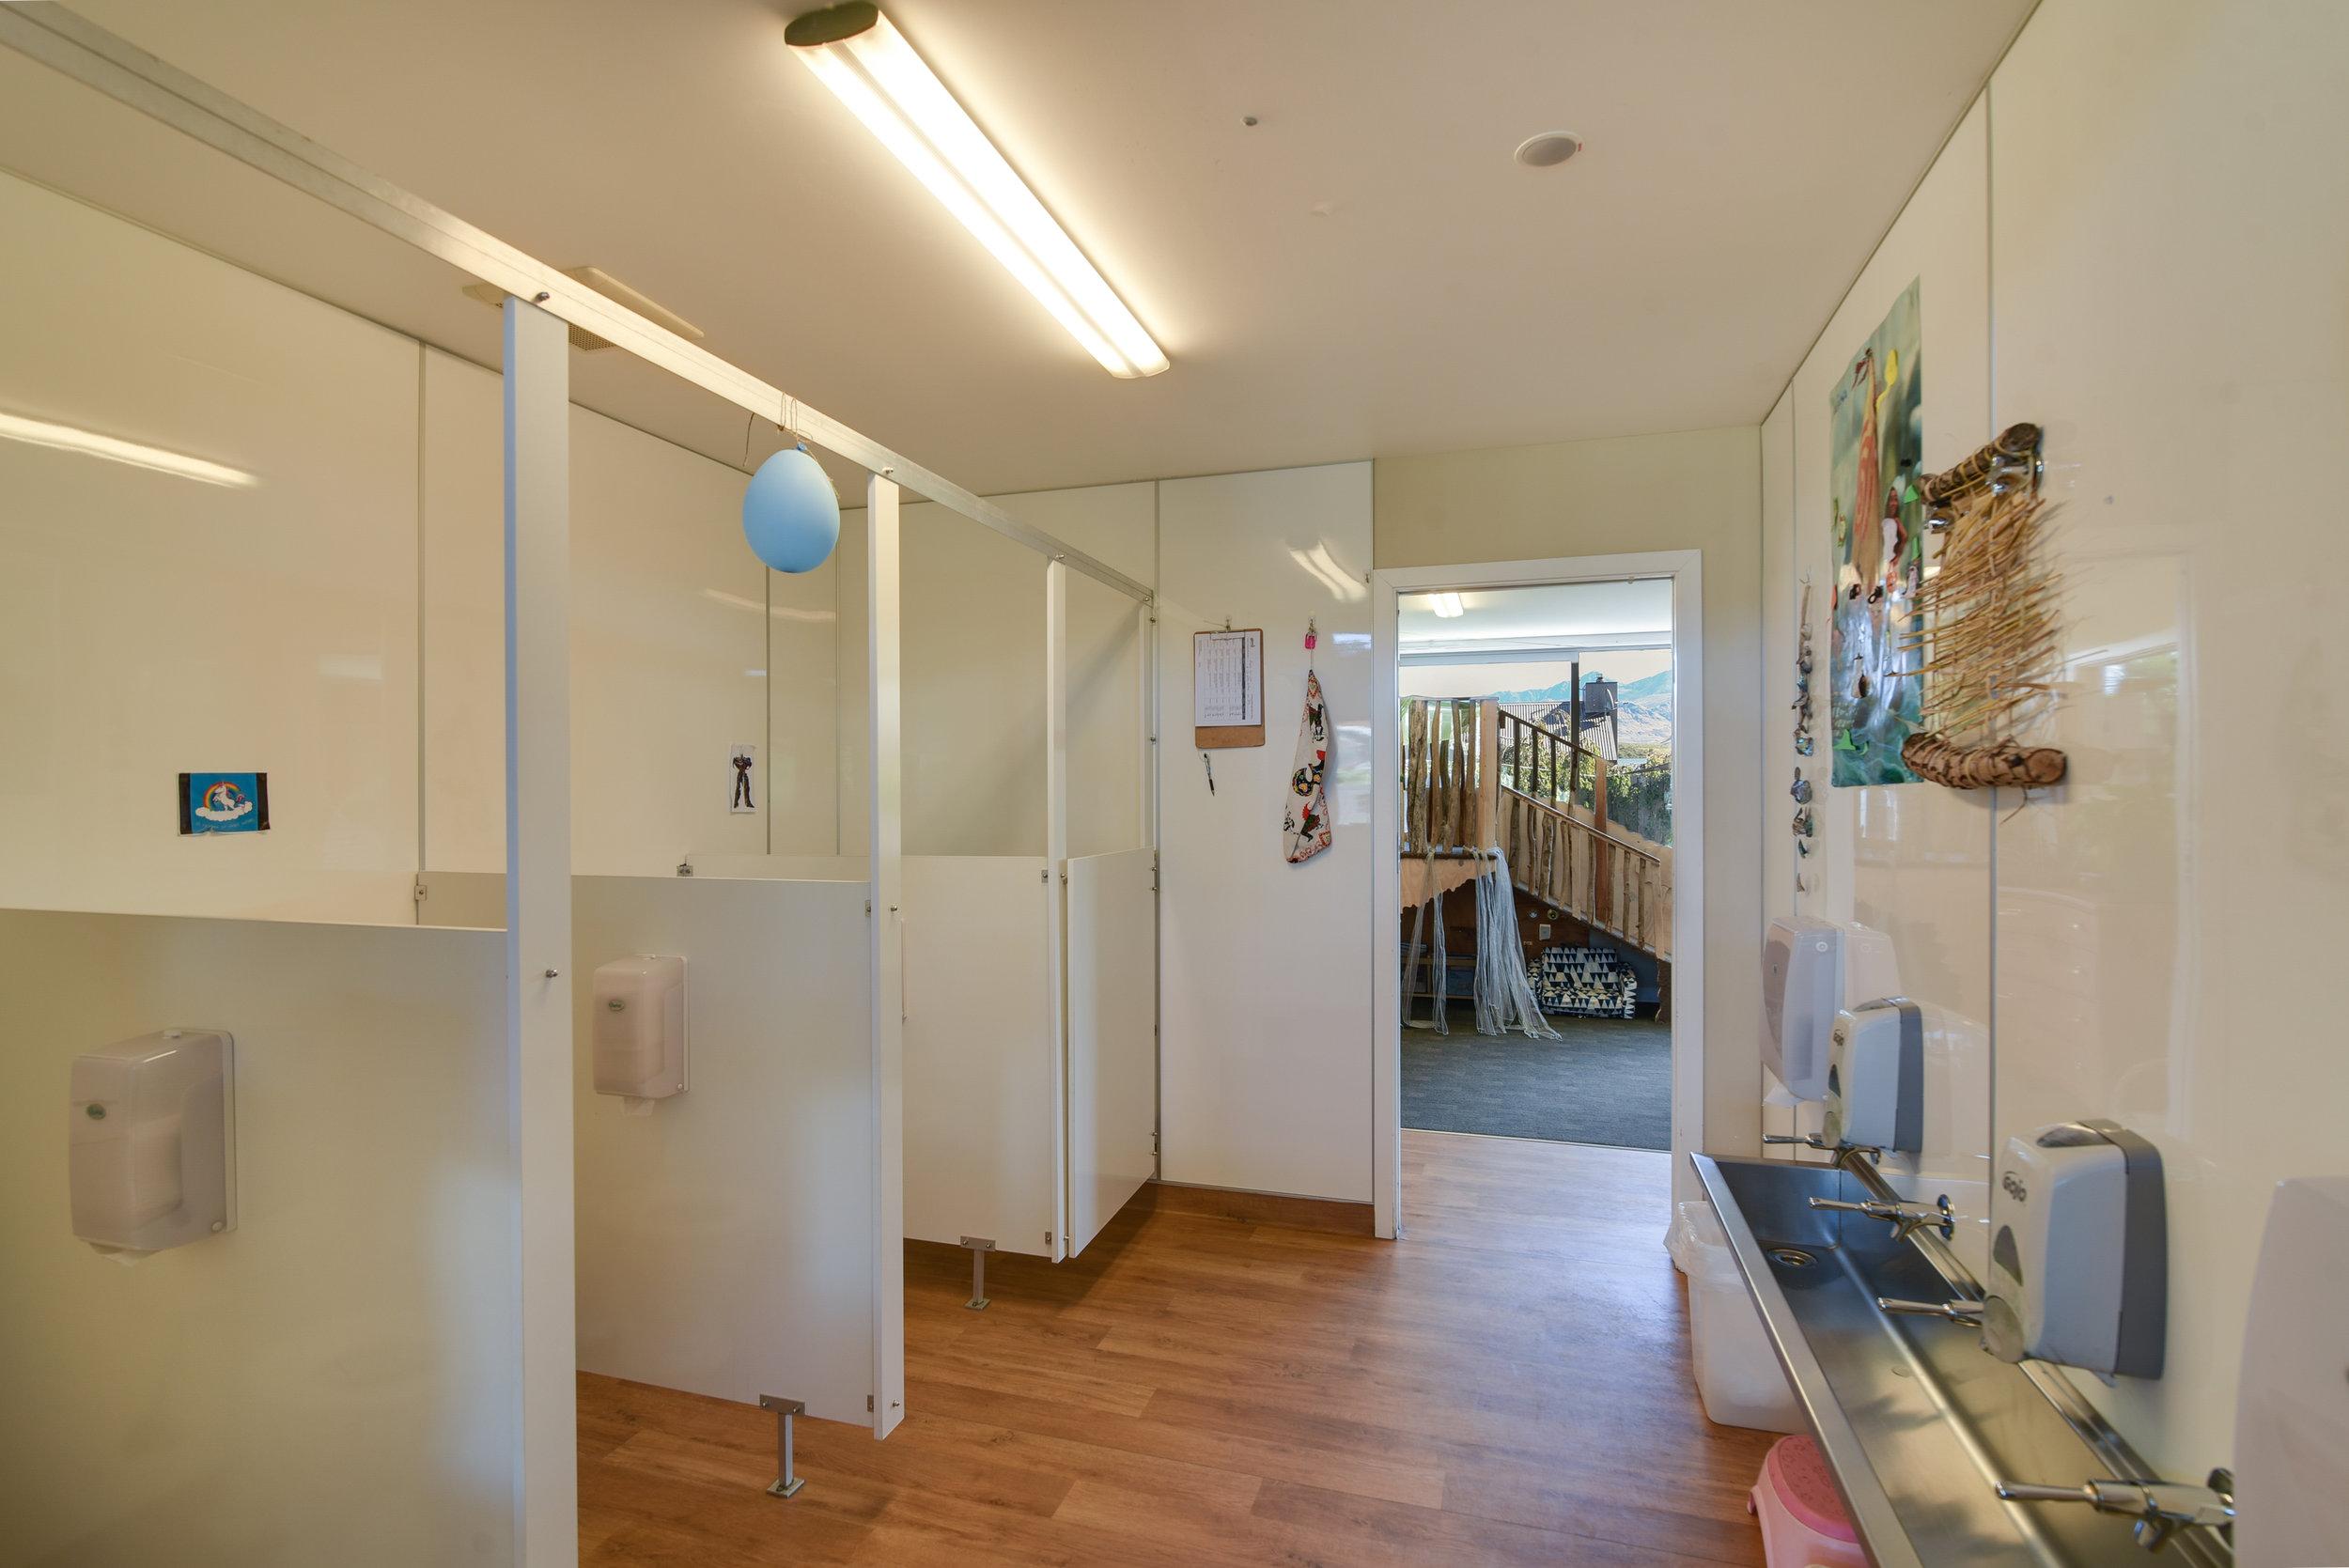 Gems Childcare interiors-28.jpg